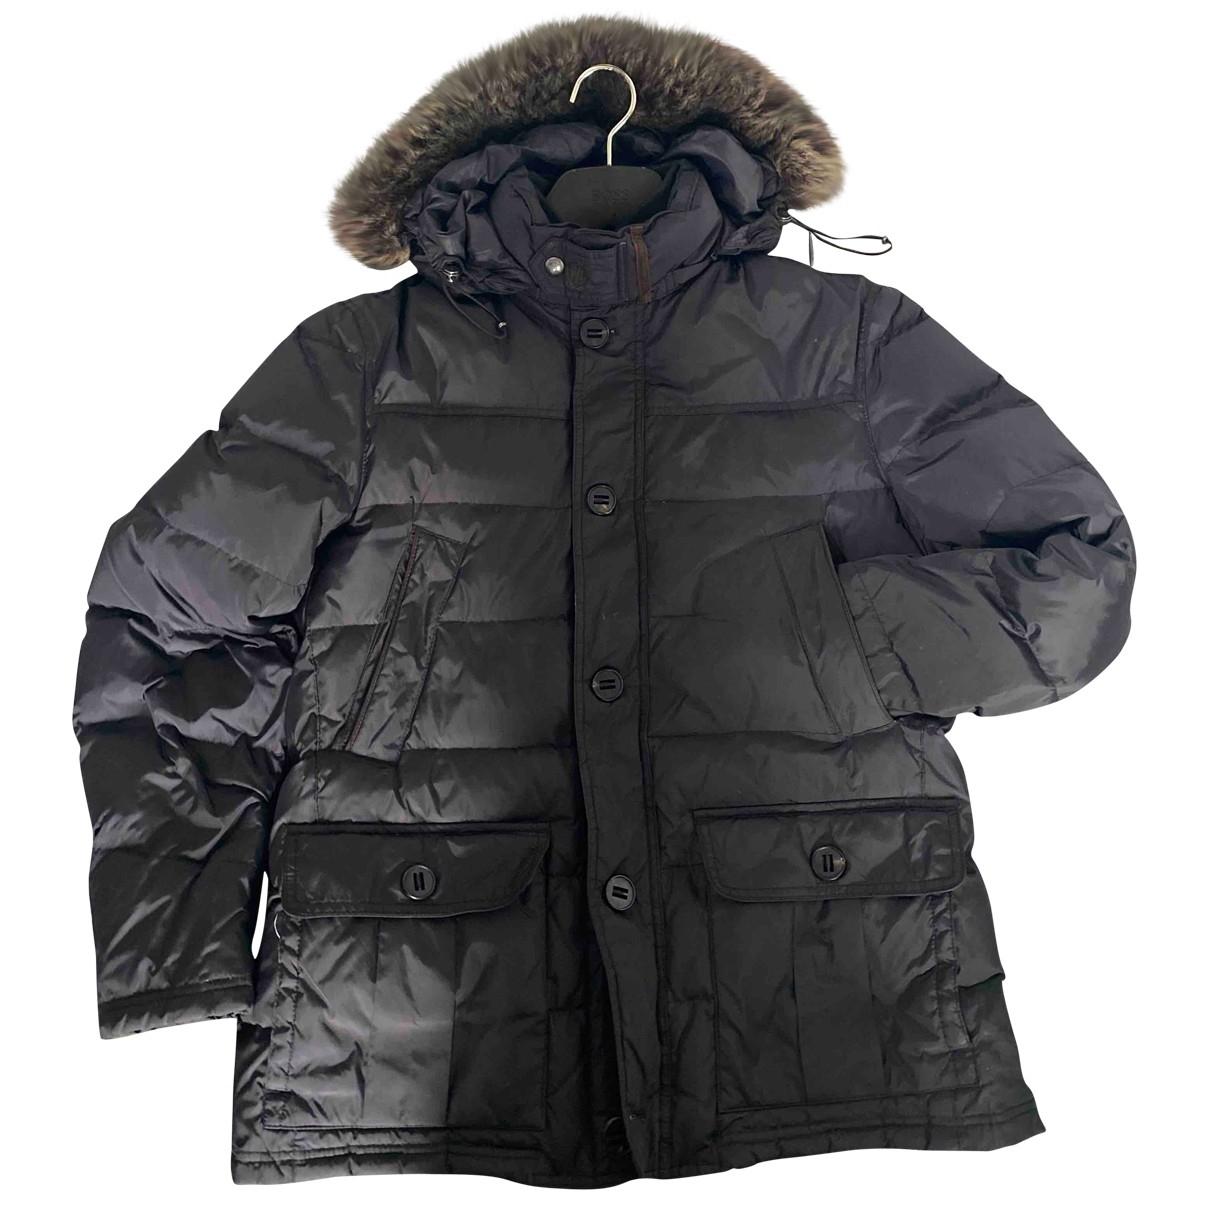 Massimo Dutti \N Black jacket  for Men L International